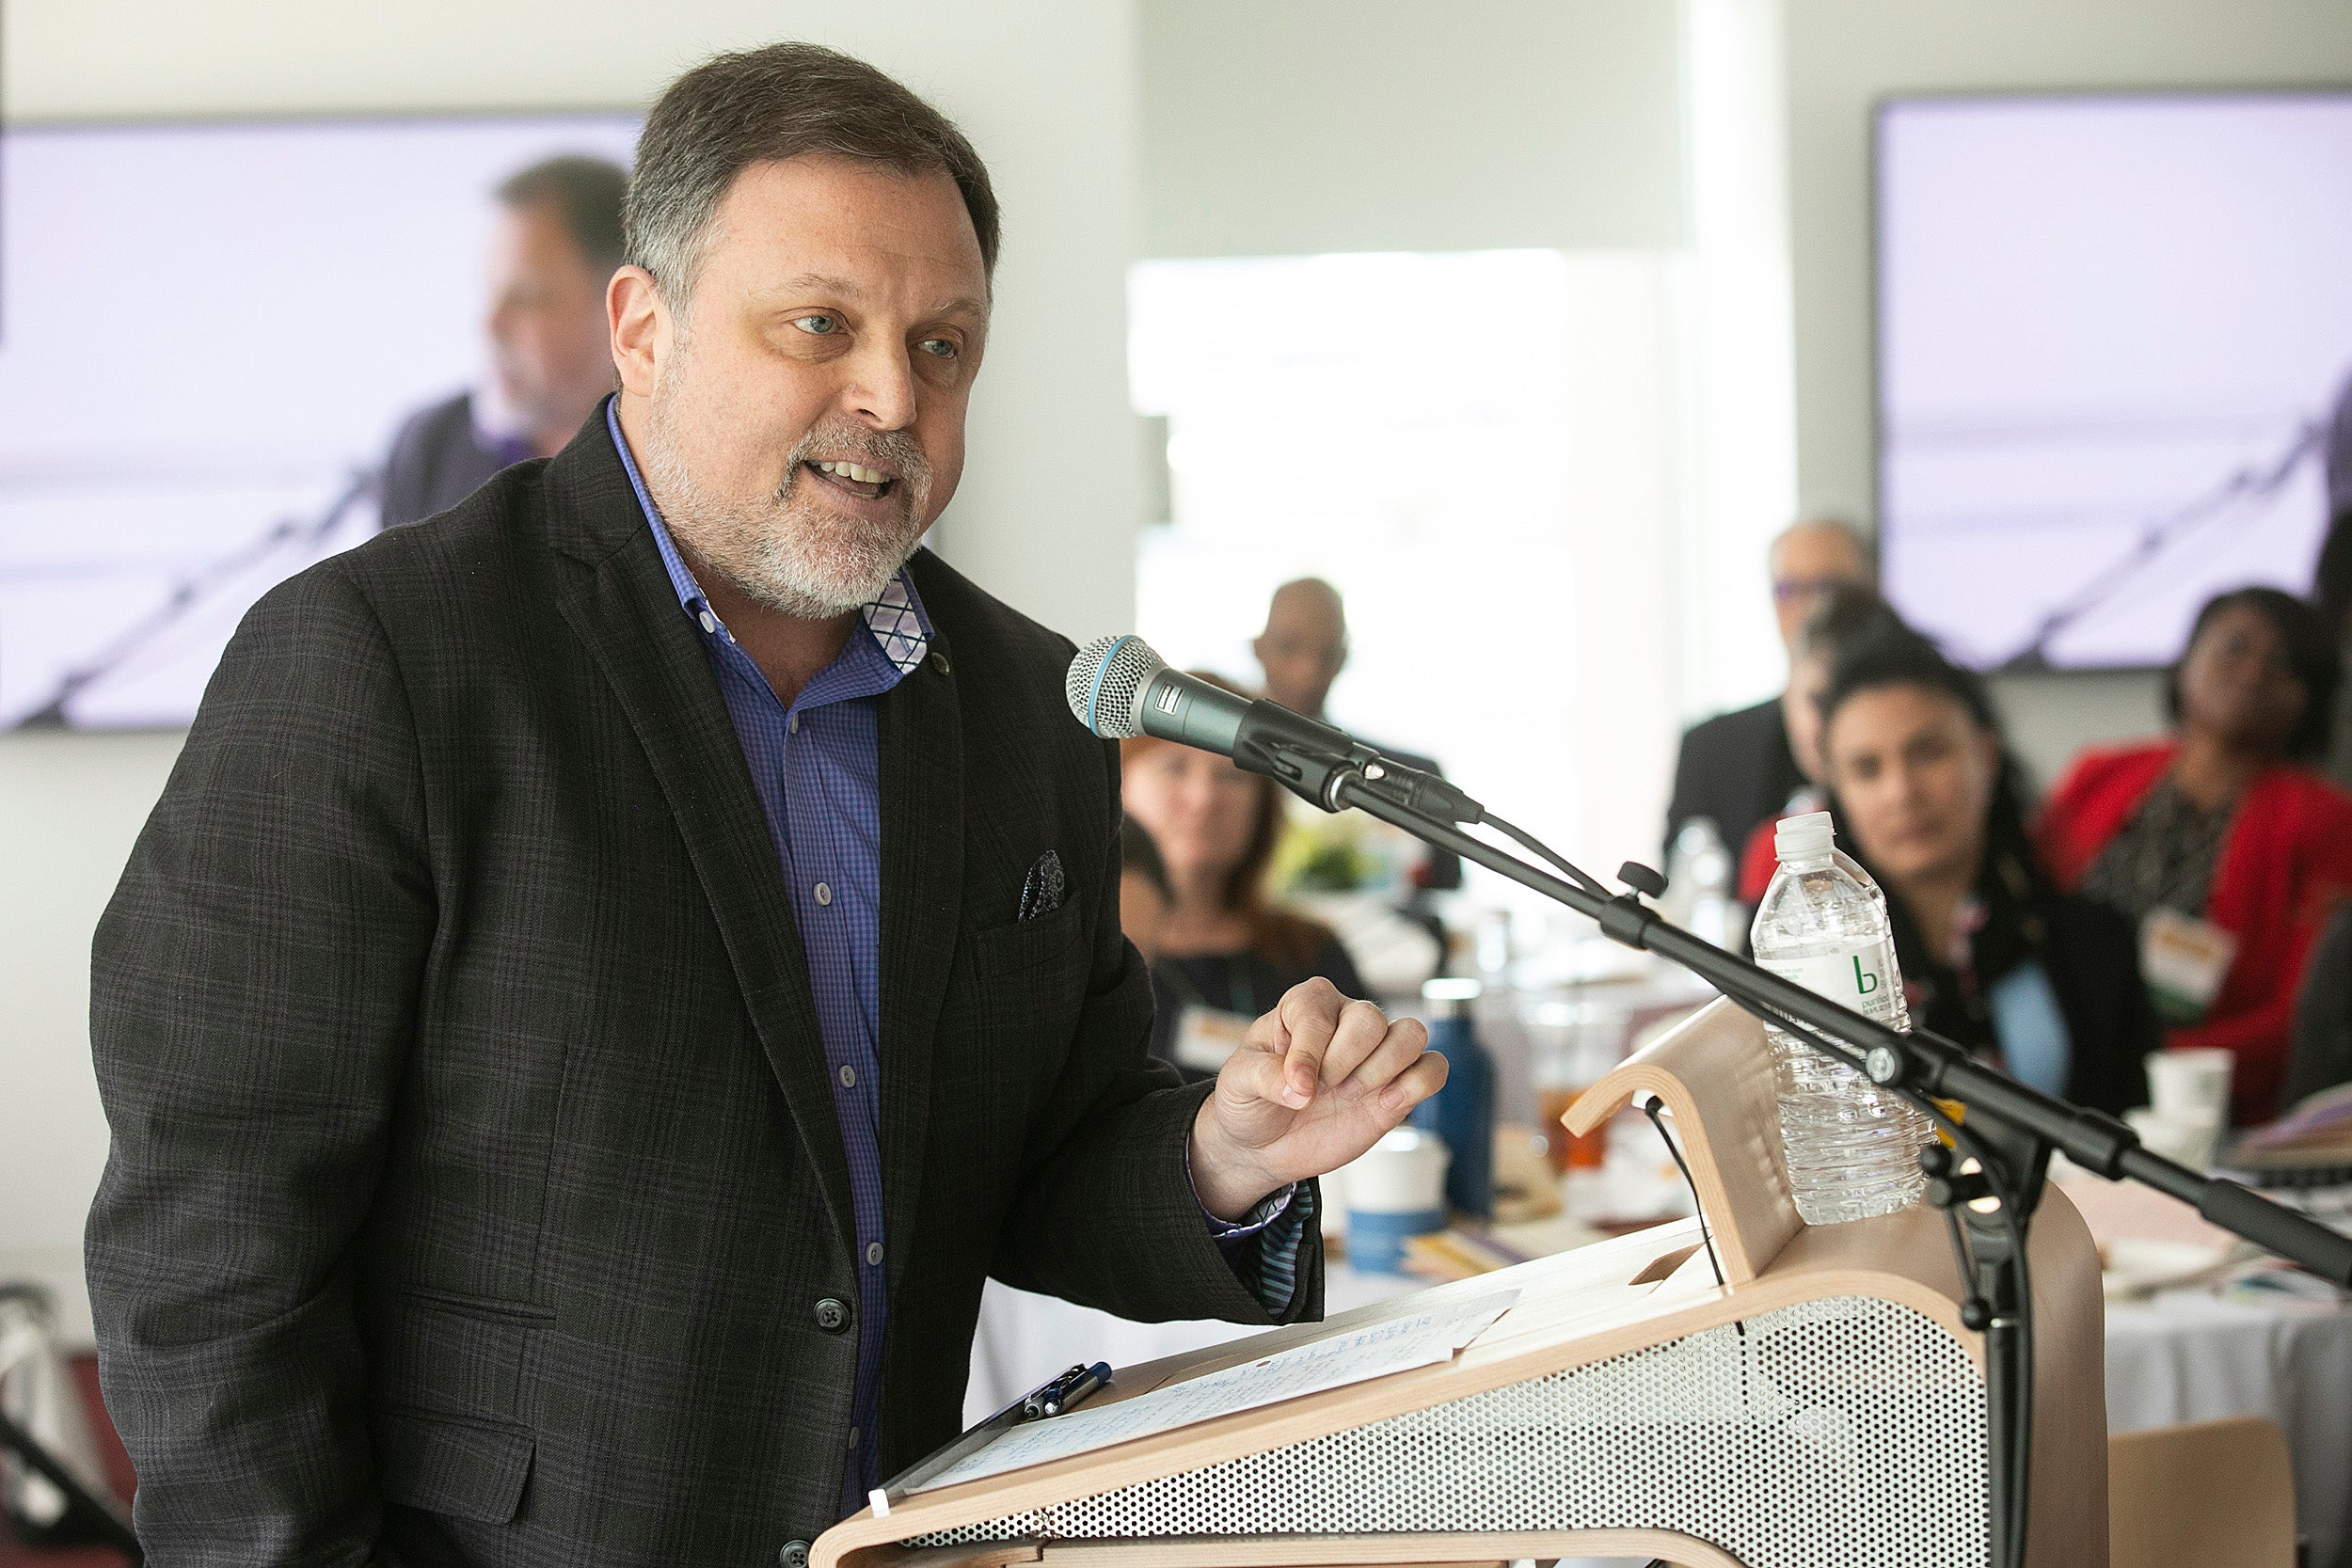 Keynote speaker Tim Wise at the symposium on diversity.